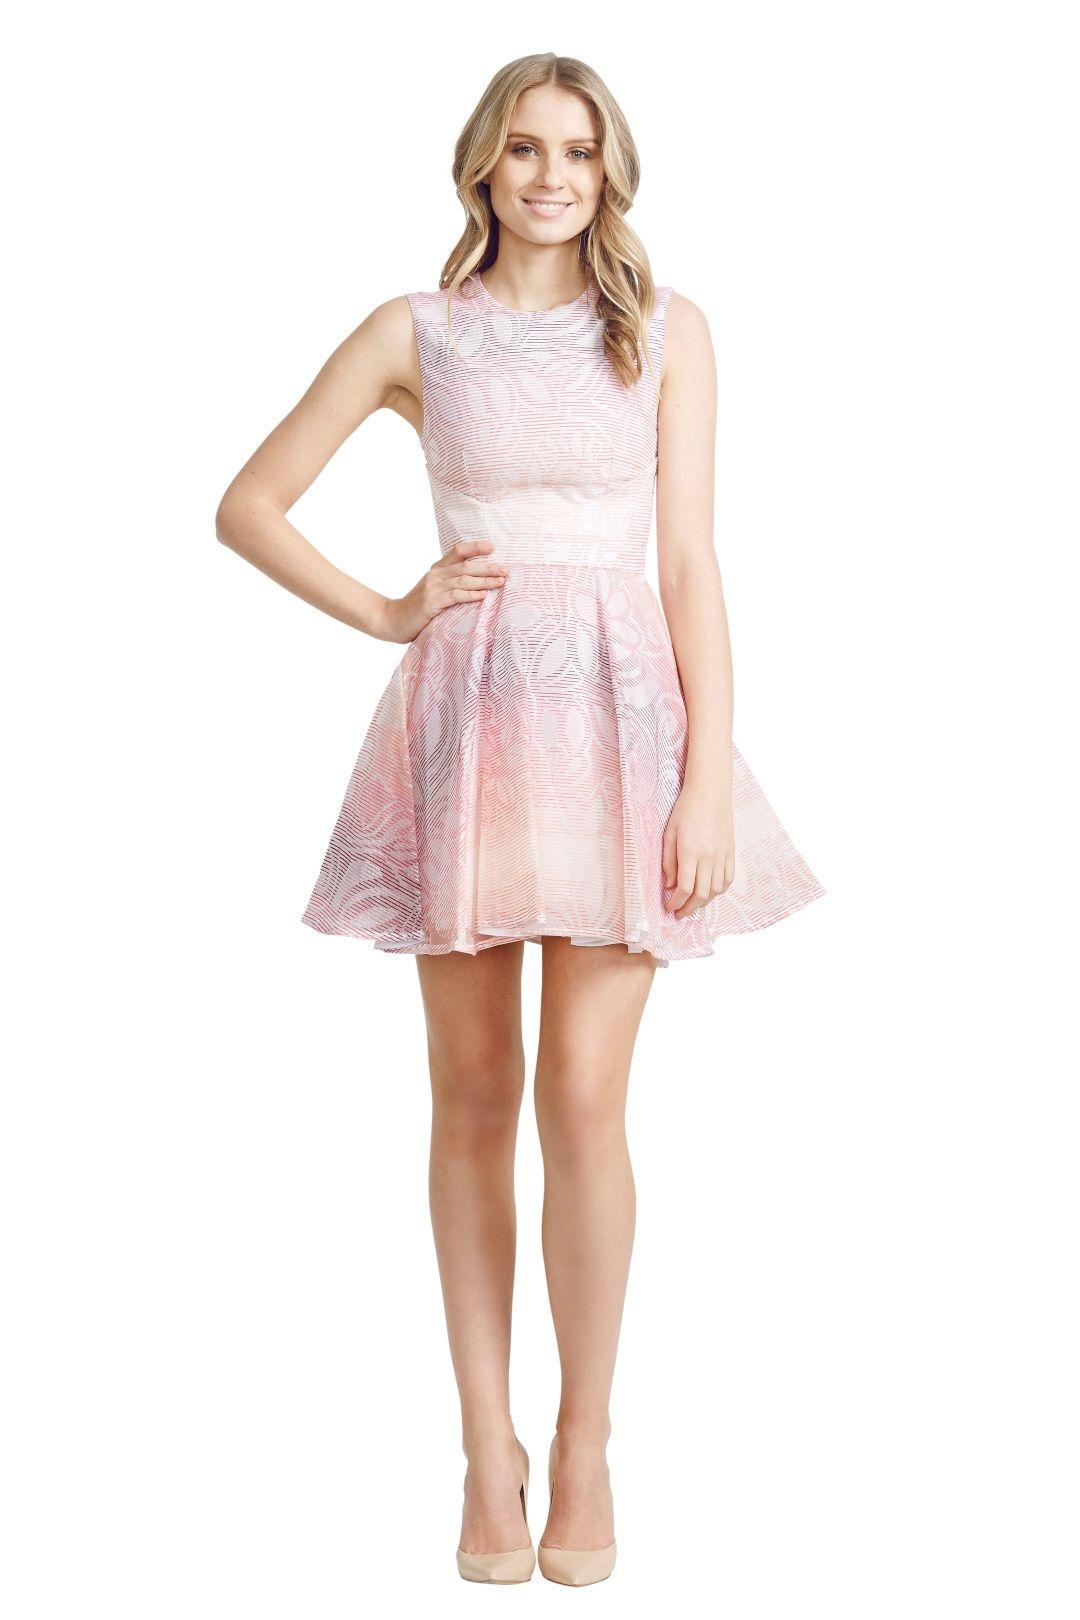 Nicola Finetti - Insert Pleat Dress - Pink - Front